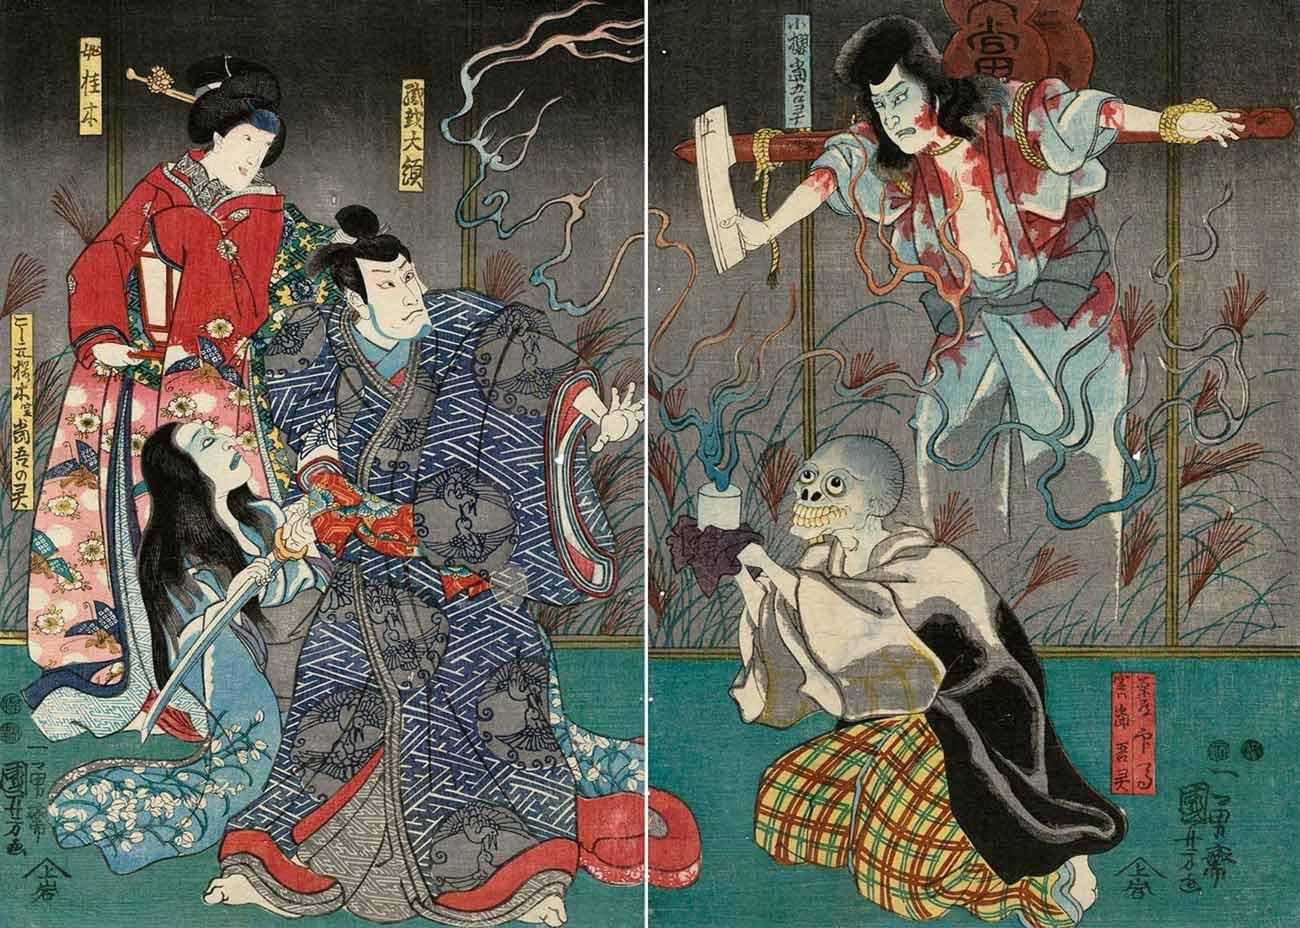 The Ghost of Asakura Togo, Woodblock Print by Utagawa Kuniyoshi